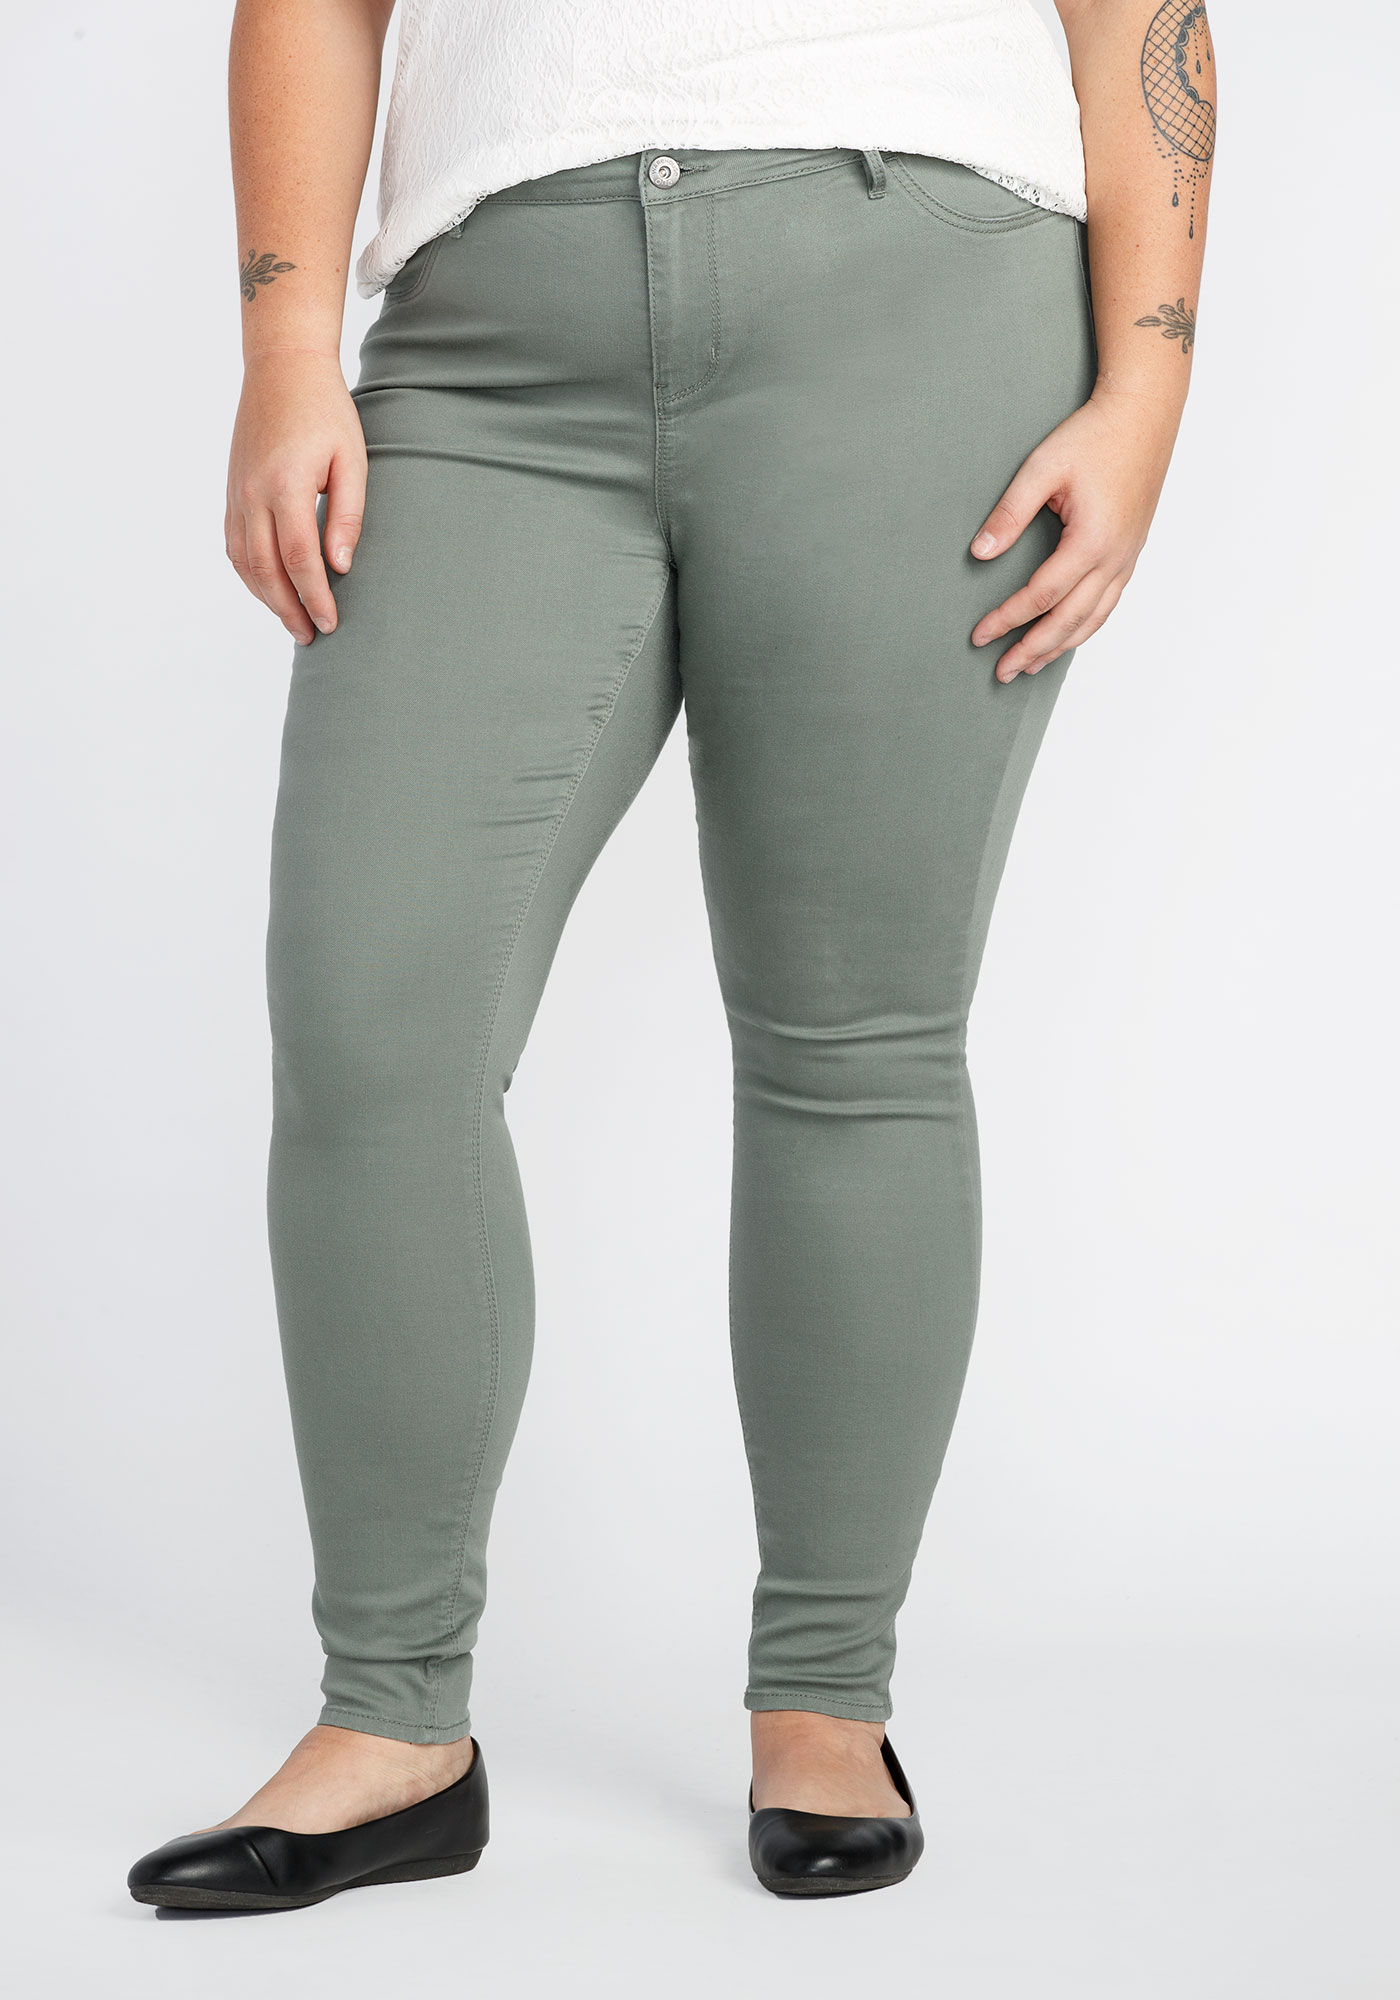 6d3897a0328 Women s Plus Size Skinny Pant